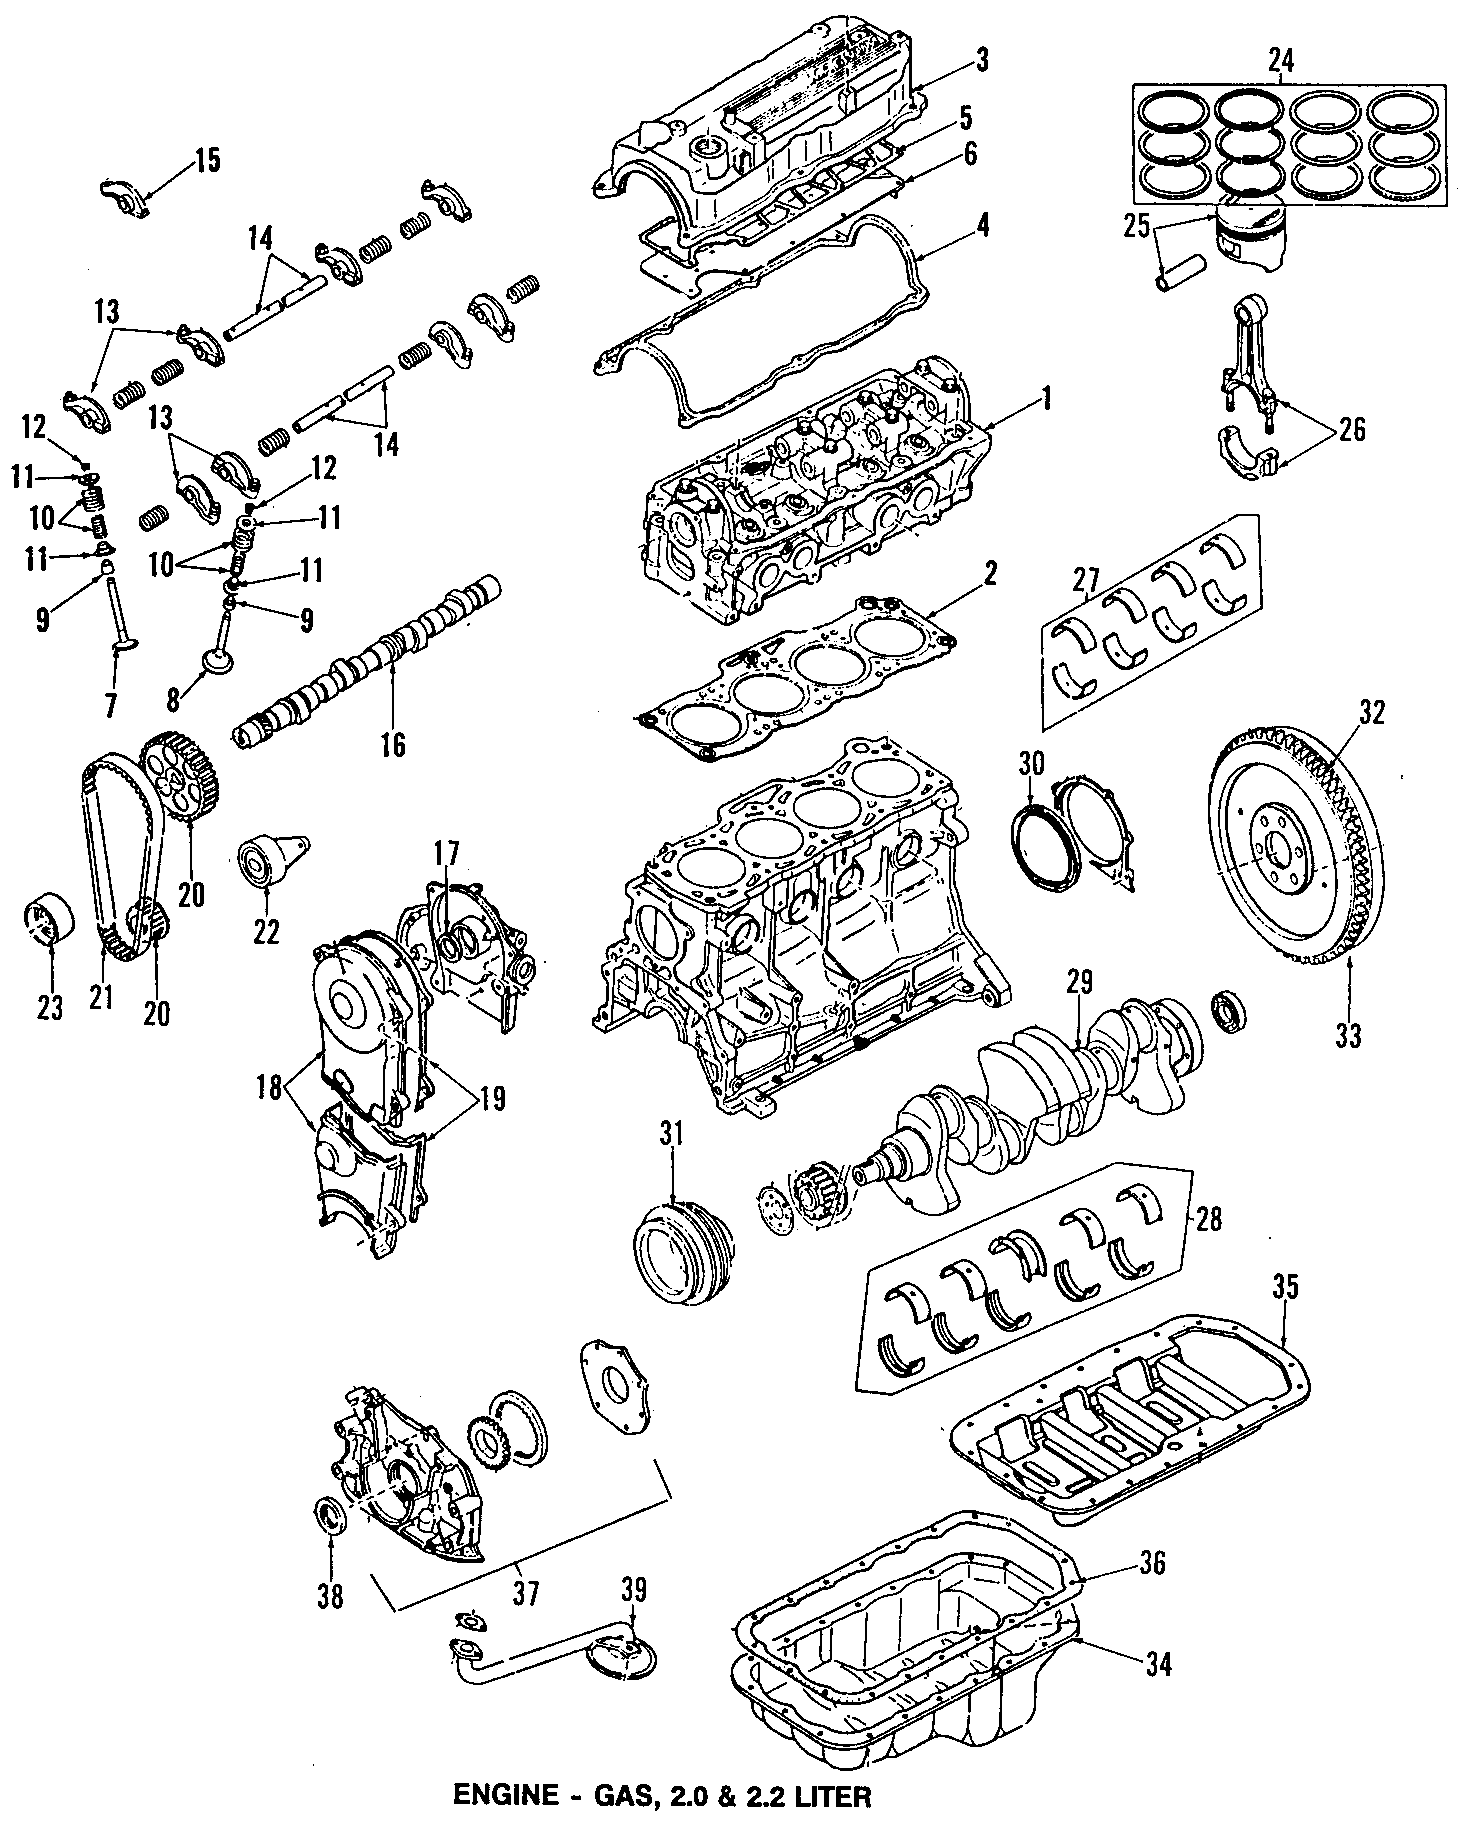 Mazda B Engine Timing Crankshaft Sprocket 626